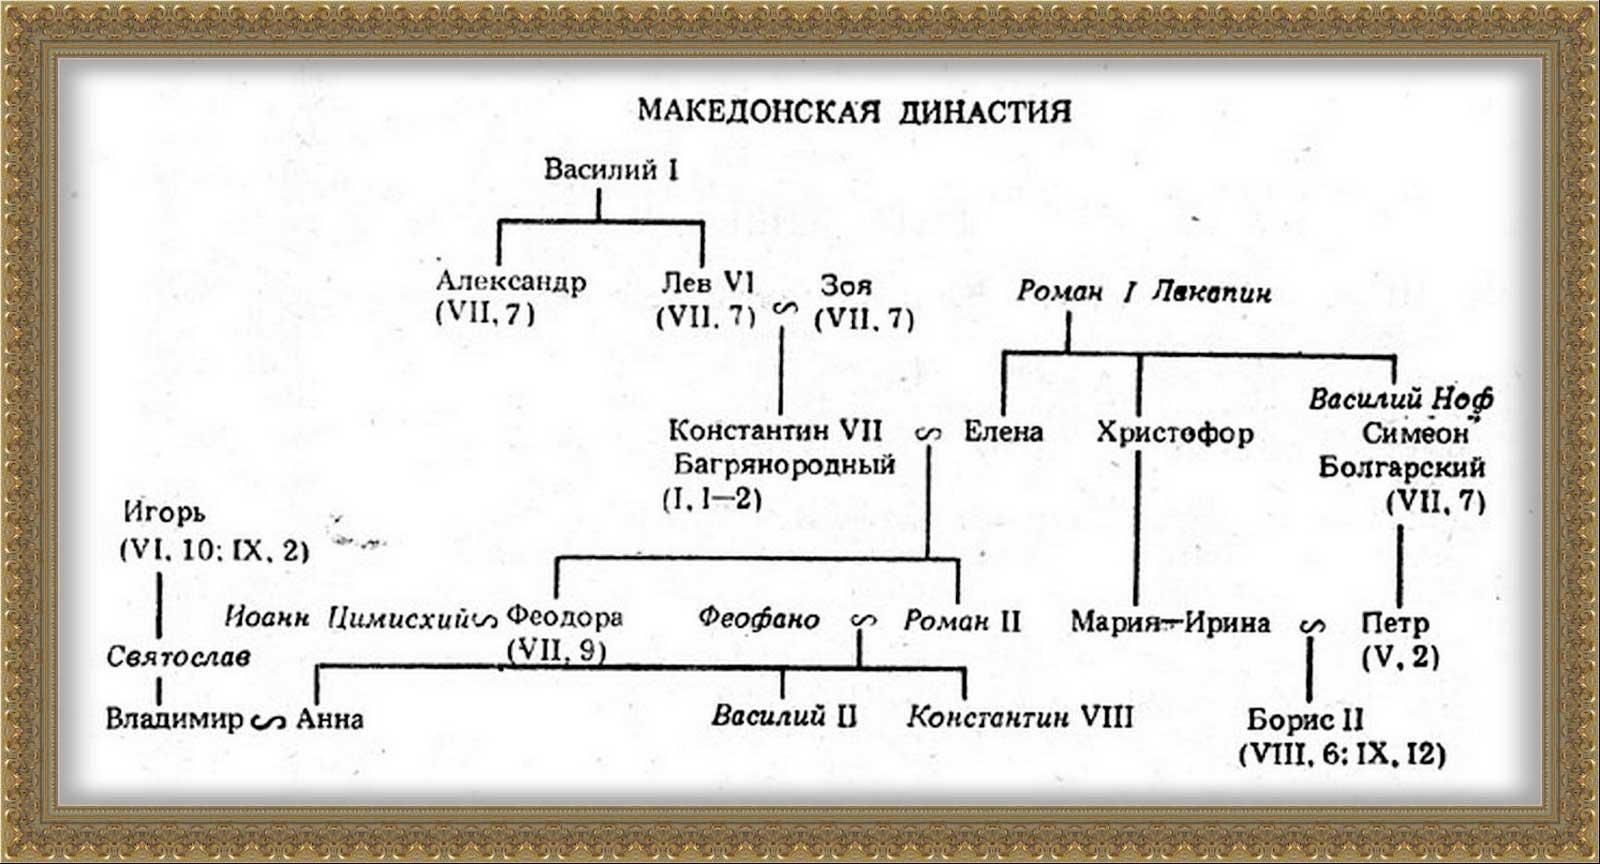 Родовое дерево династии Василия I